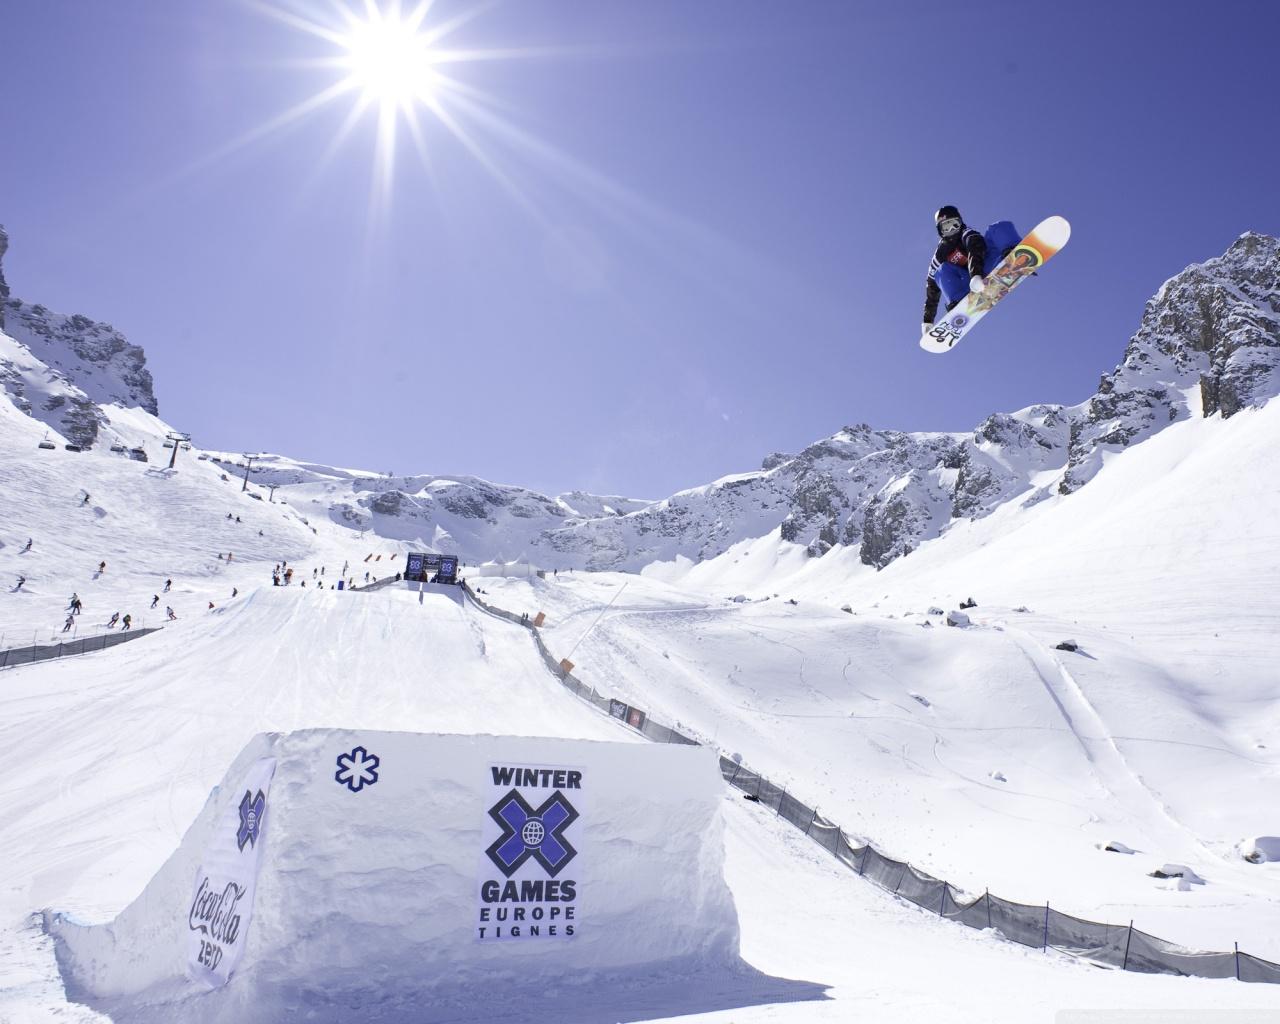 Winter Games Europe Tignes 4K HD Desktop Wallpaper for 4K Ultra 1280x1024